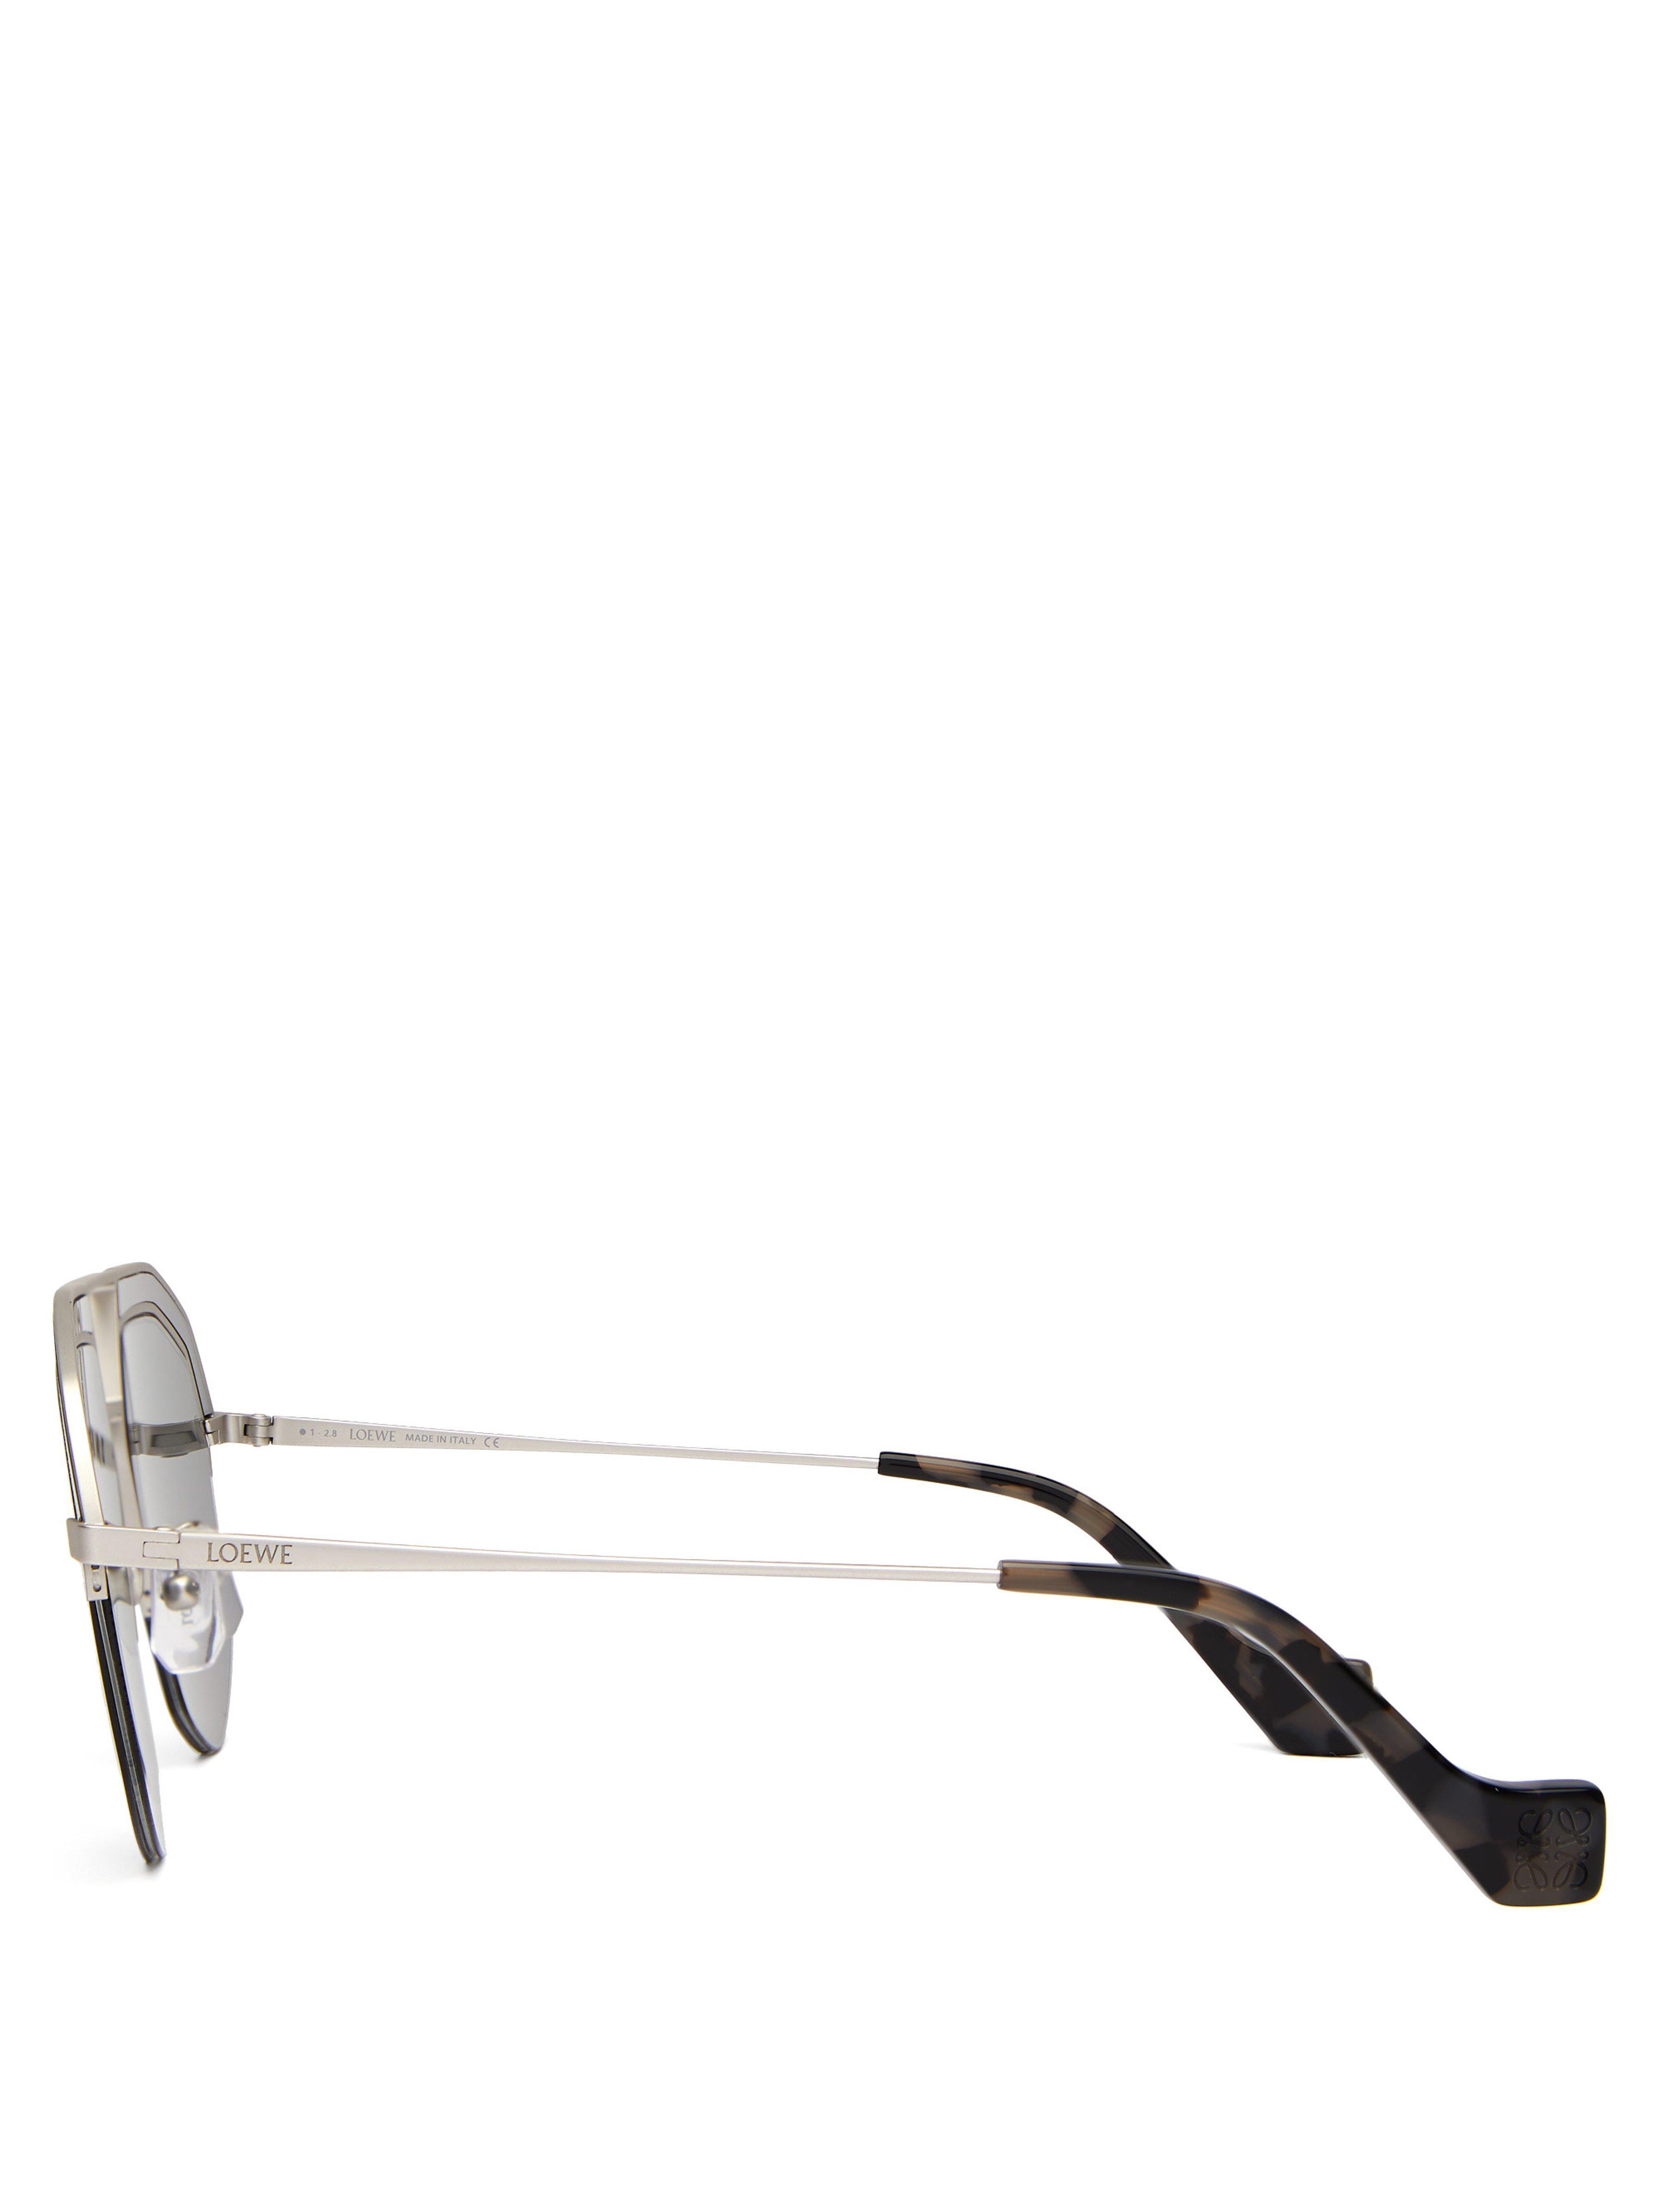 0aafe80b4f Loewe - Metallic Geometrical Aviator Metal Sunglasses - Lyst. View  fullscreen